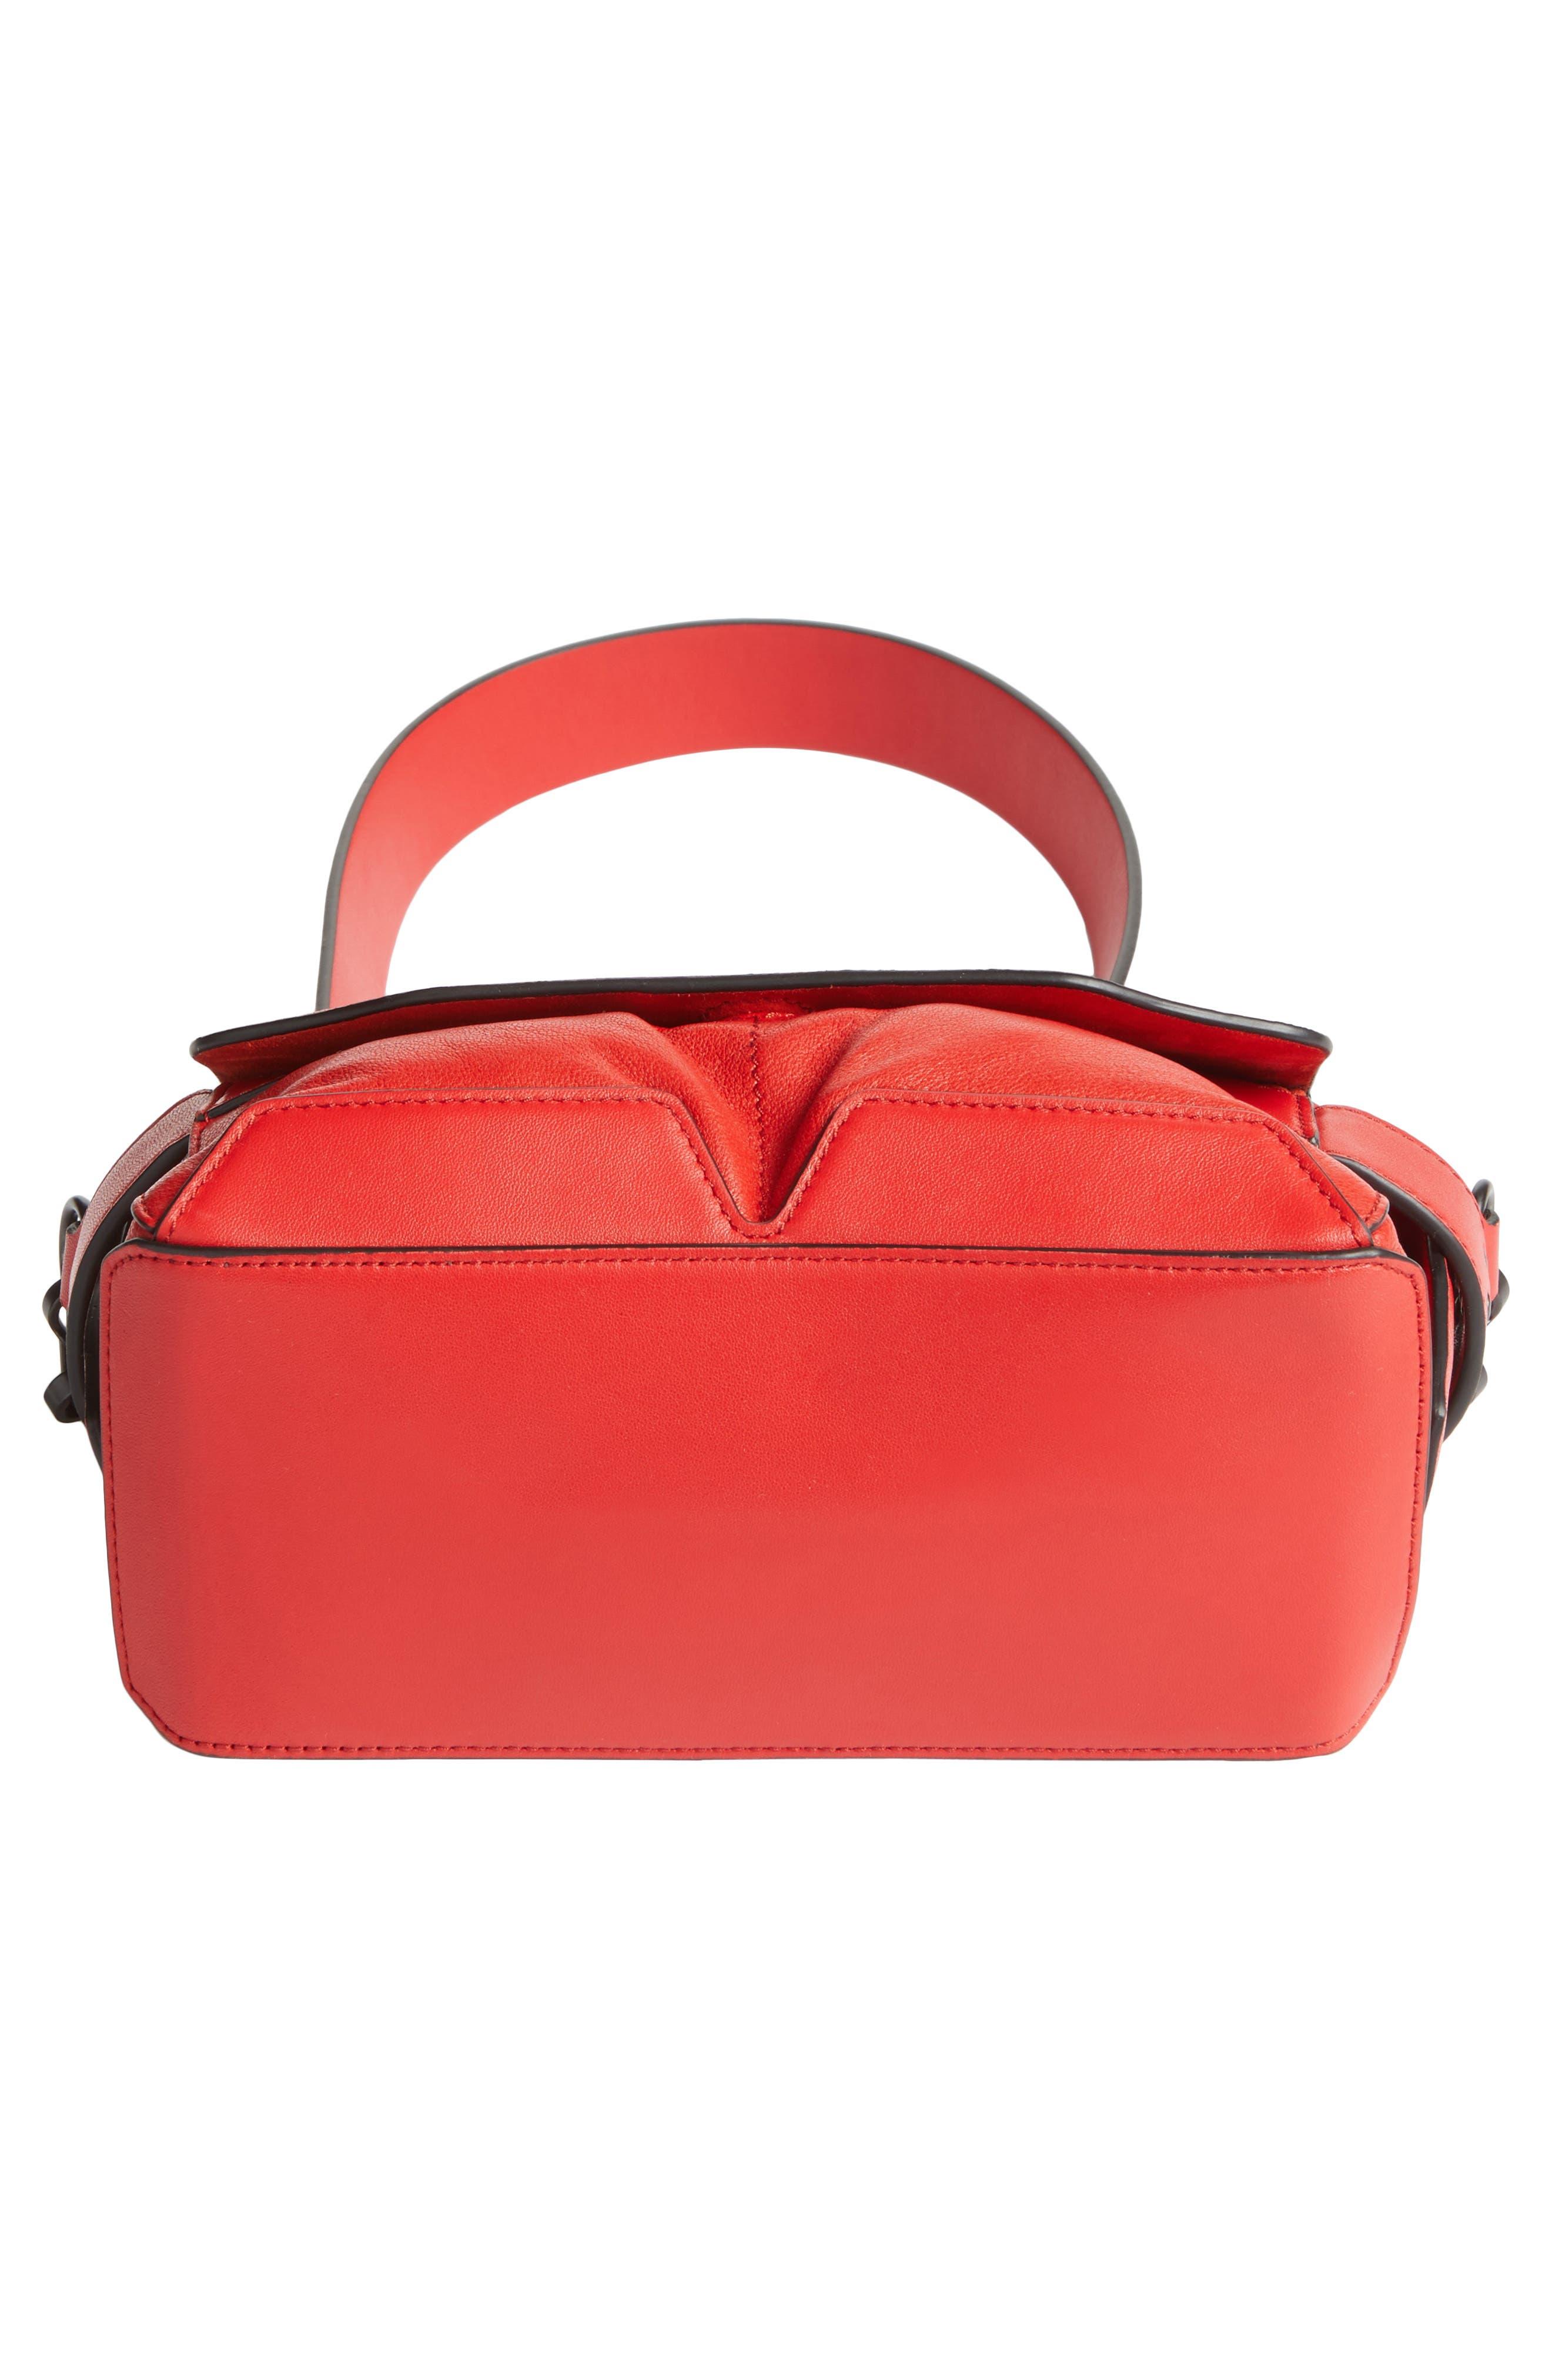 Micro Pilot Leather Satchel,                             Alternate thumbnail 5, color,                             Royal Red